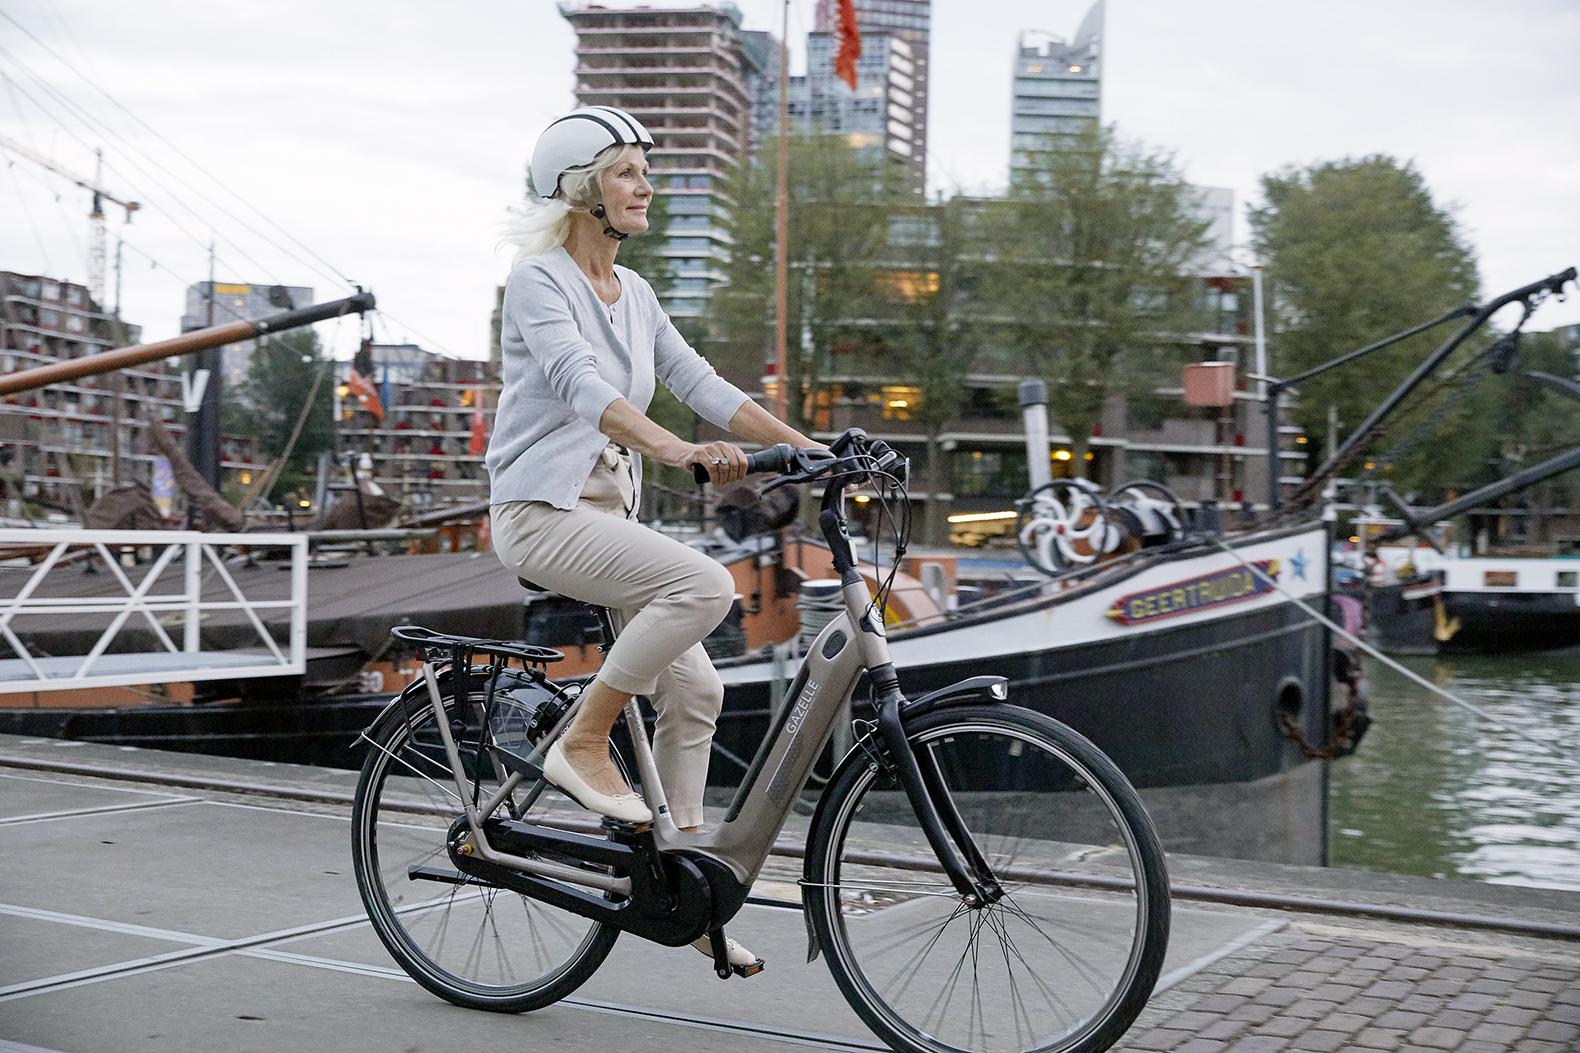 Frau auf dem Fahrrad zur Arbeit